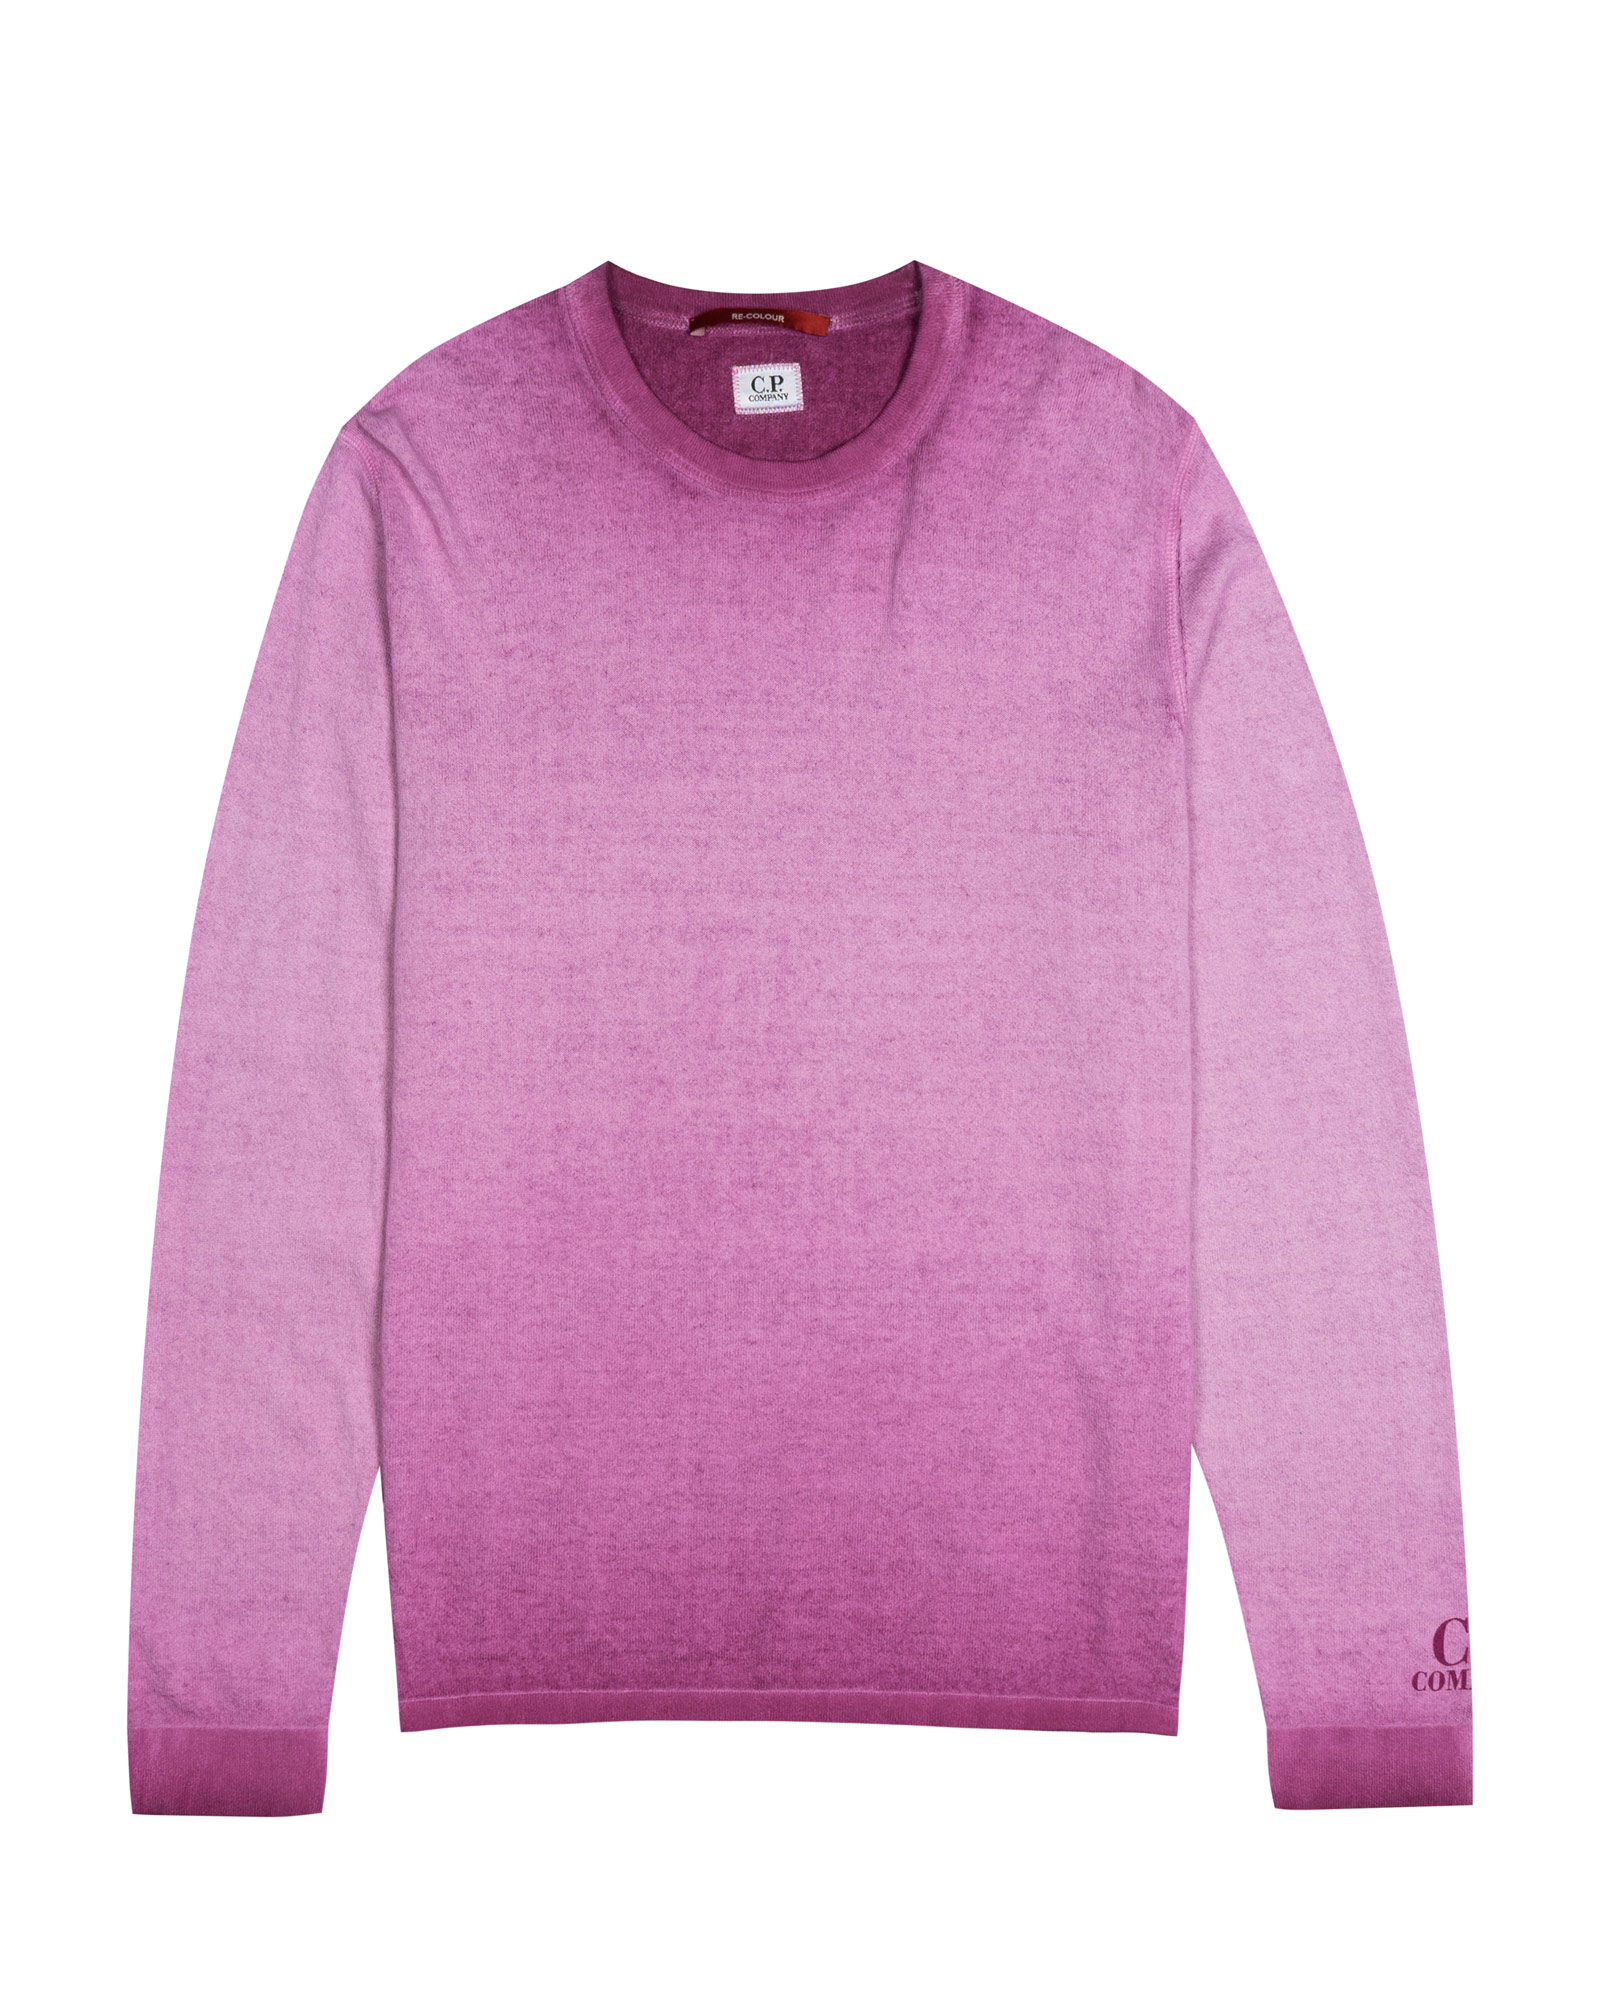 свитшот C.P.Company Hand Paint Sprayed Crewneck Sweater